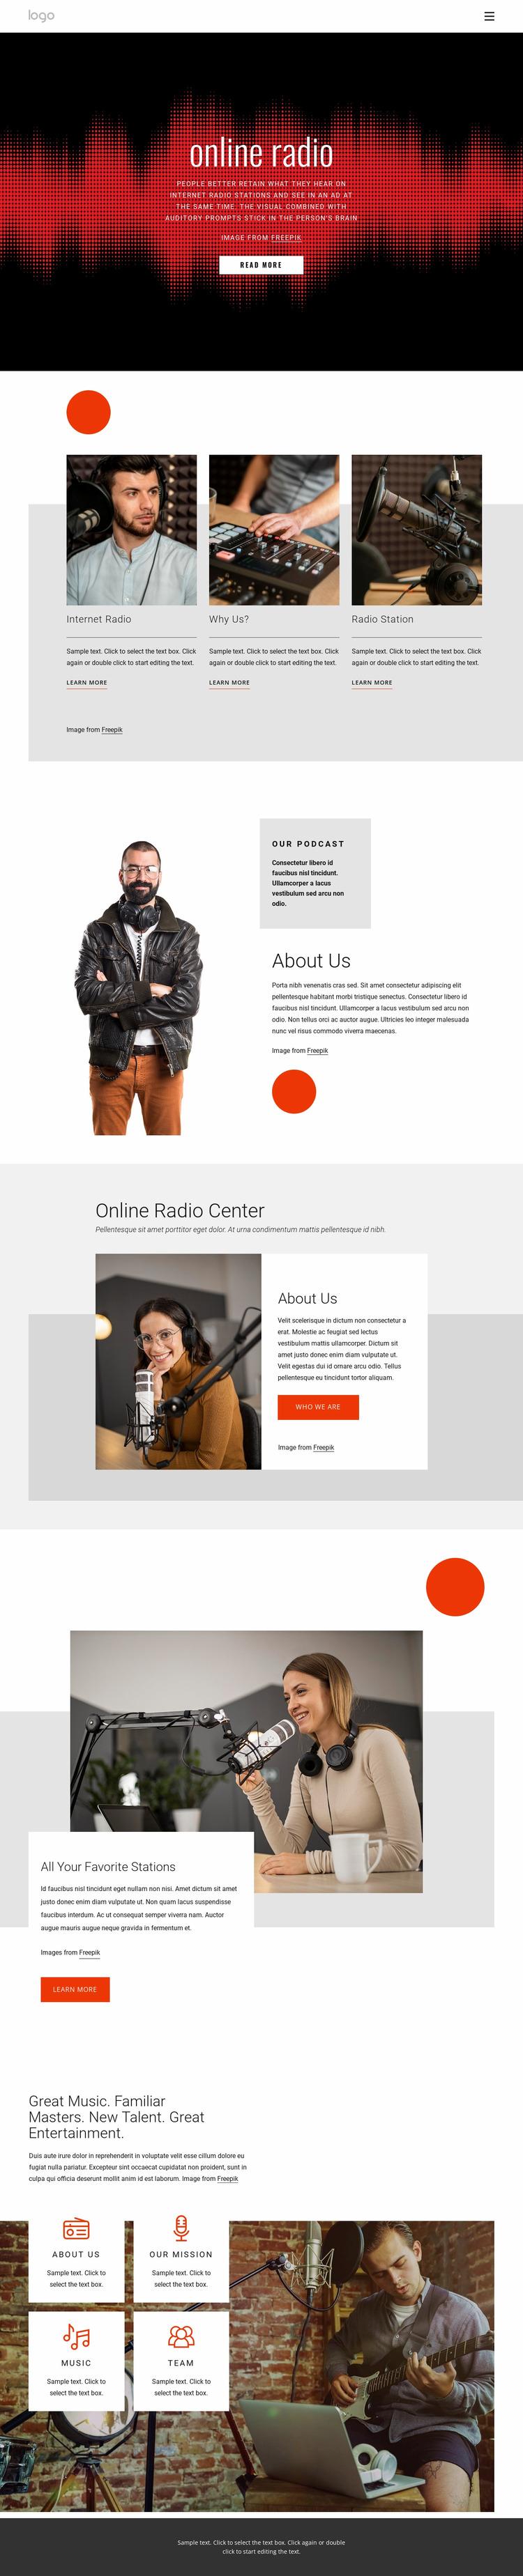 Online radio shows WordPress Website Builder